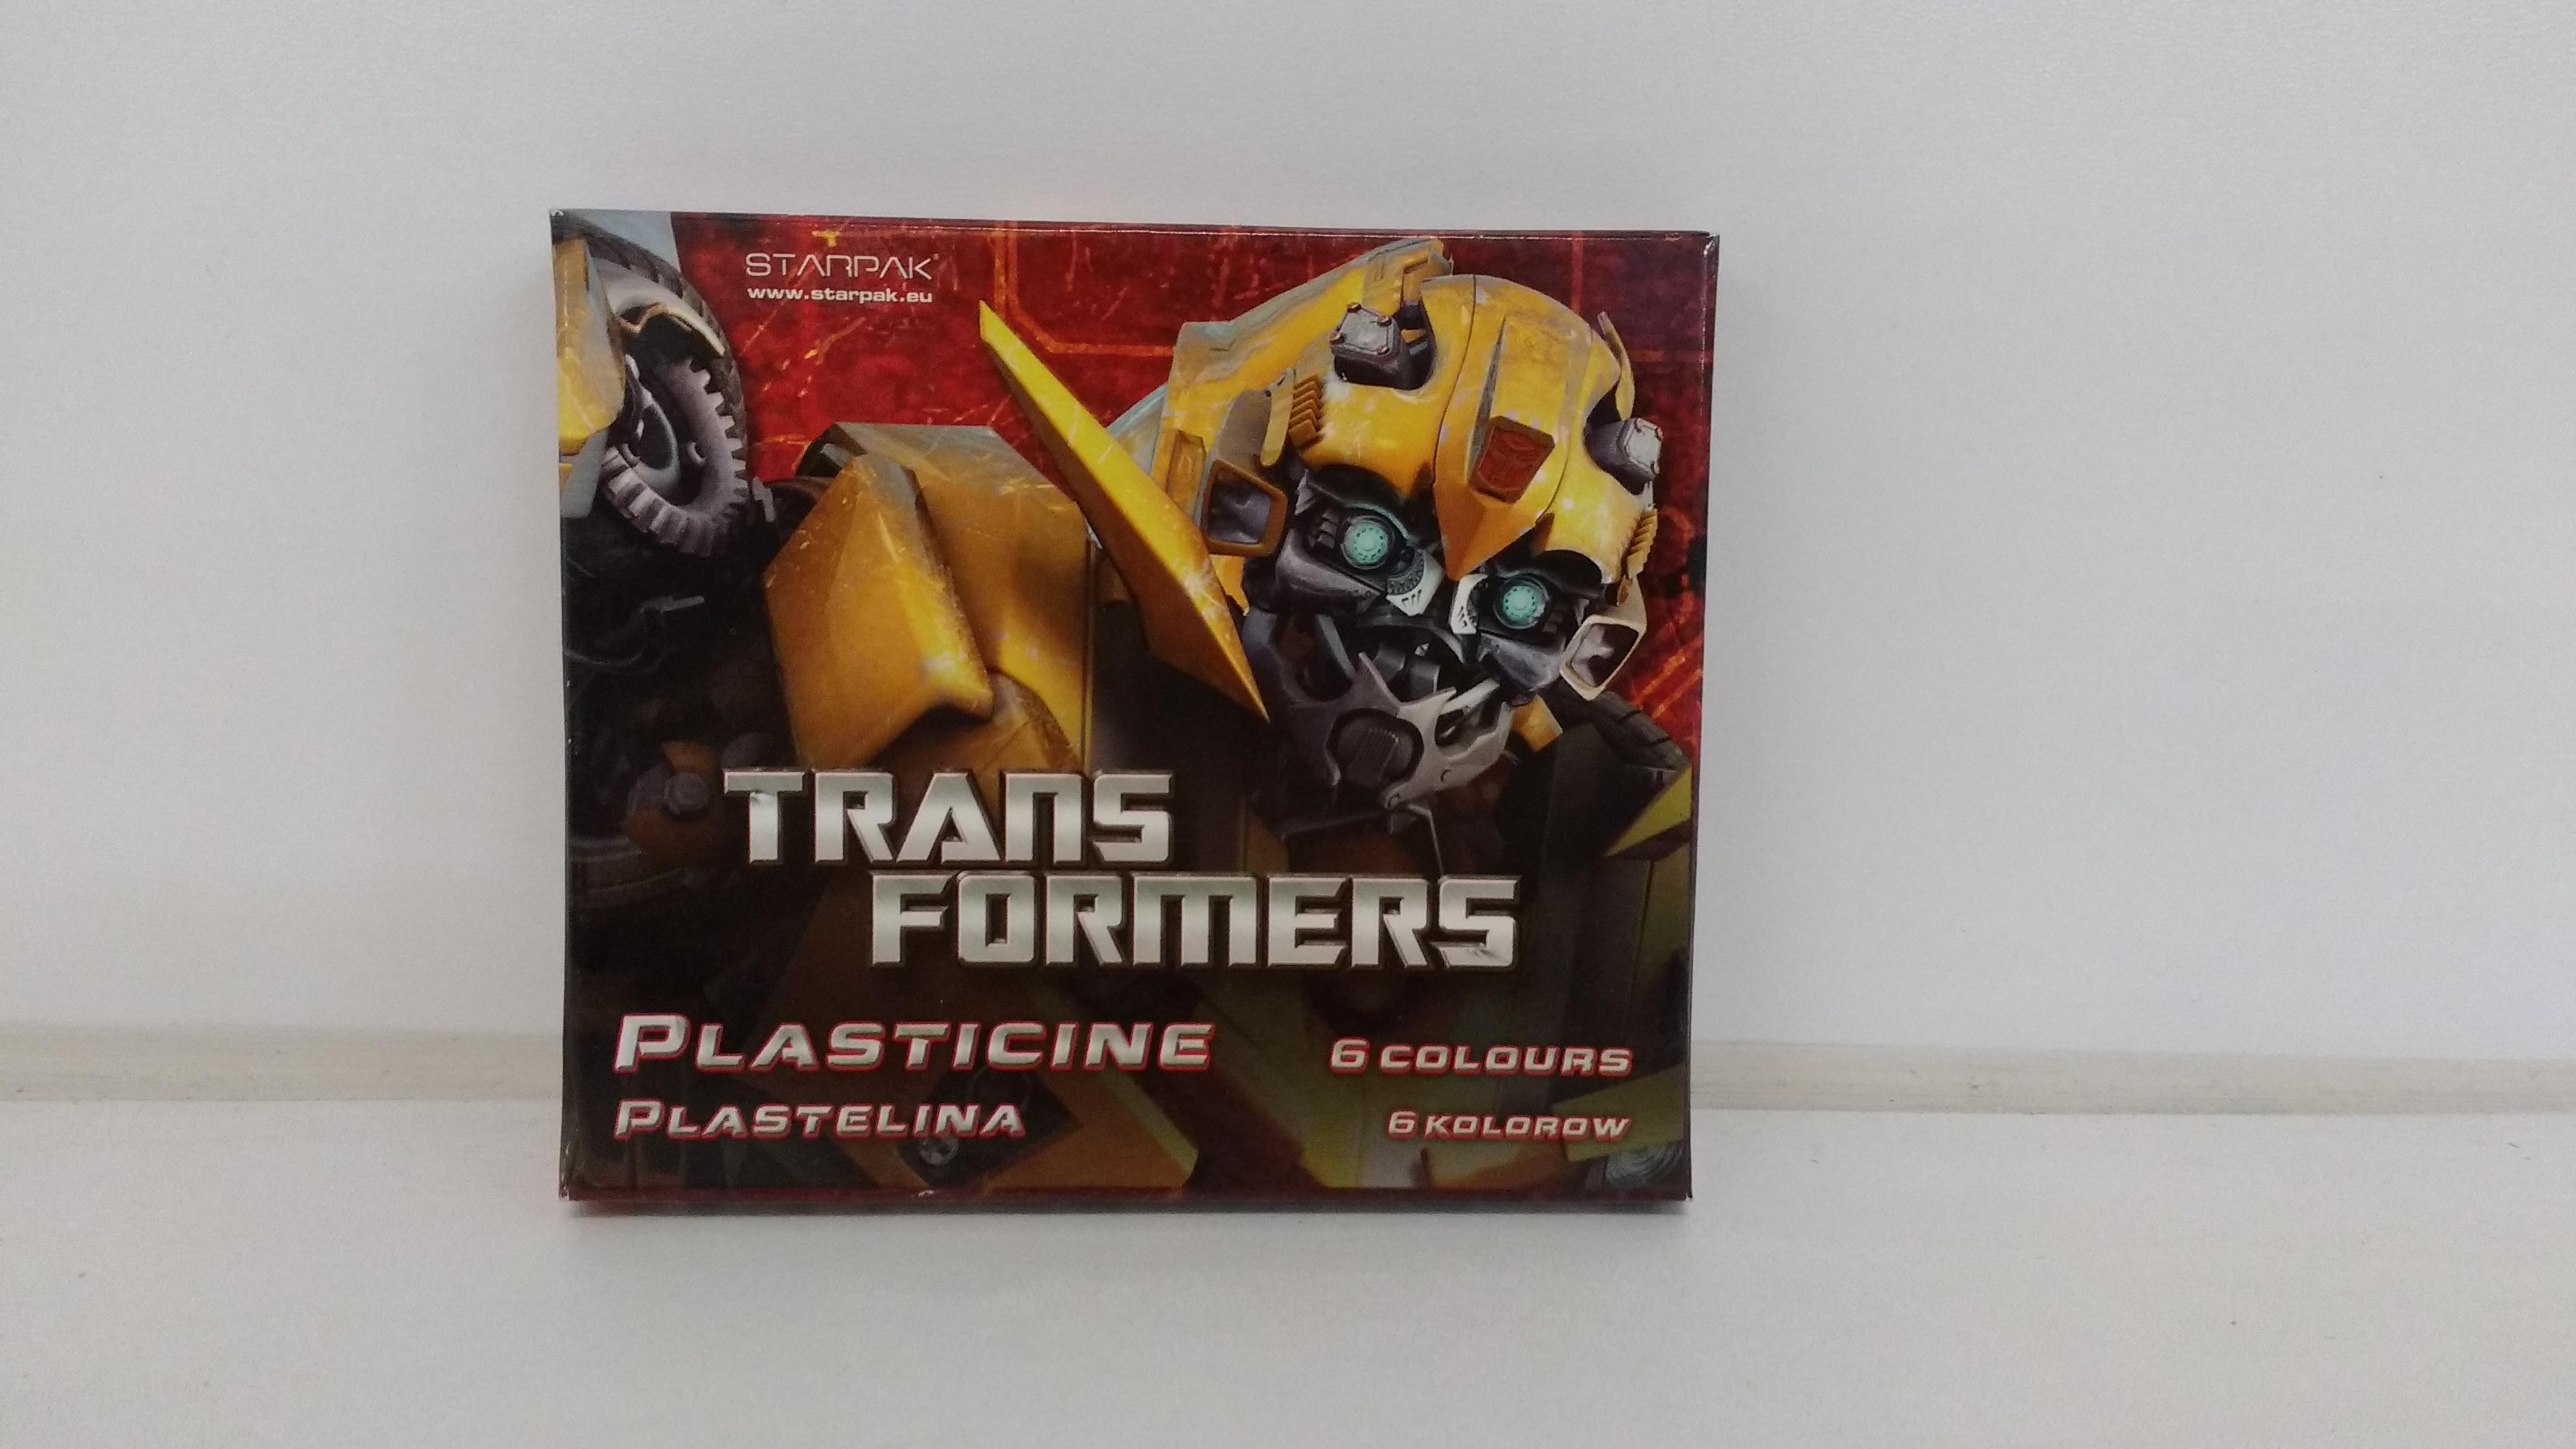 Starpak plastelina 6 kol  transformers